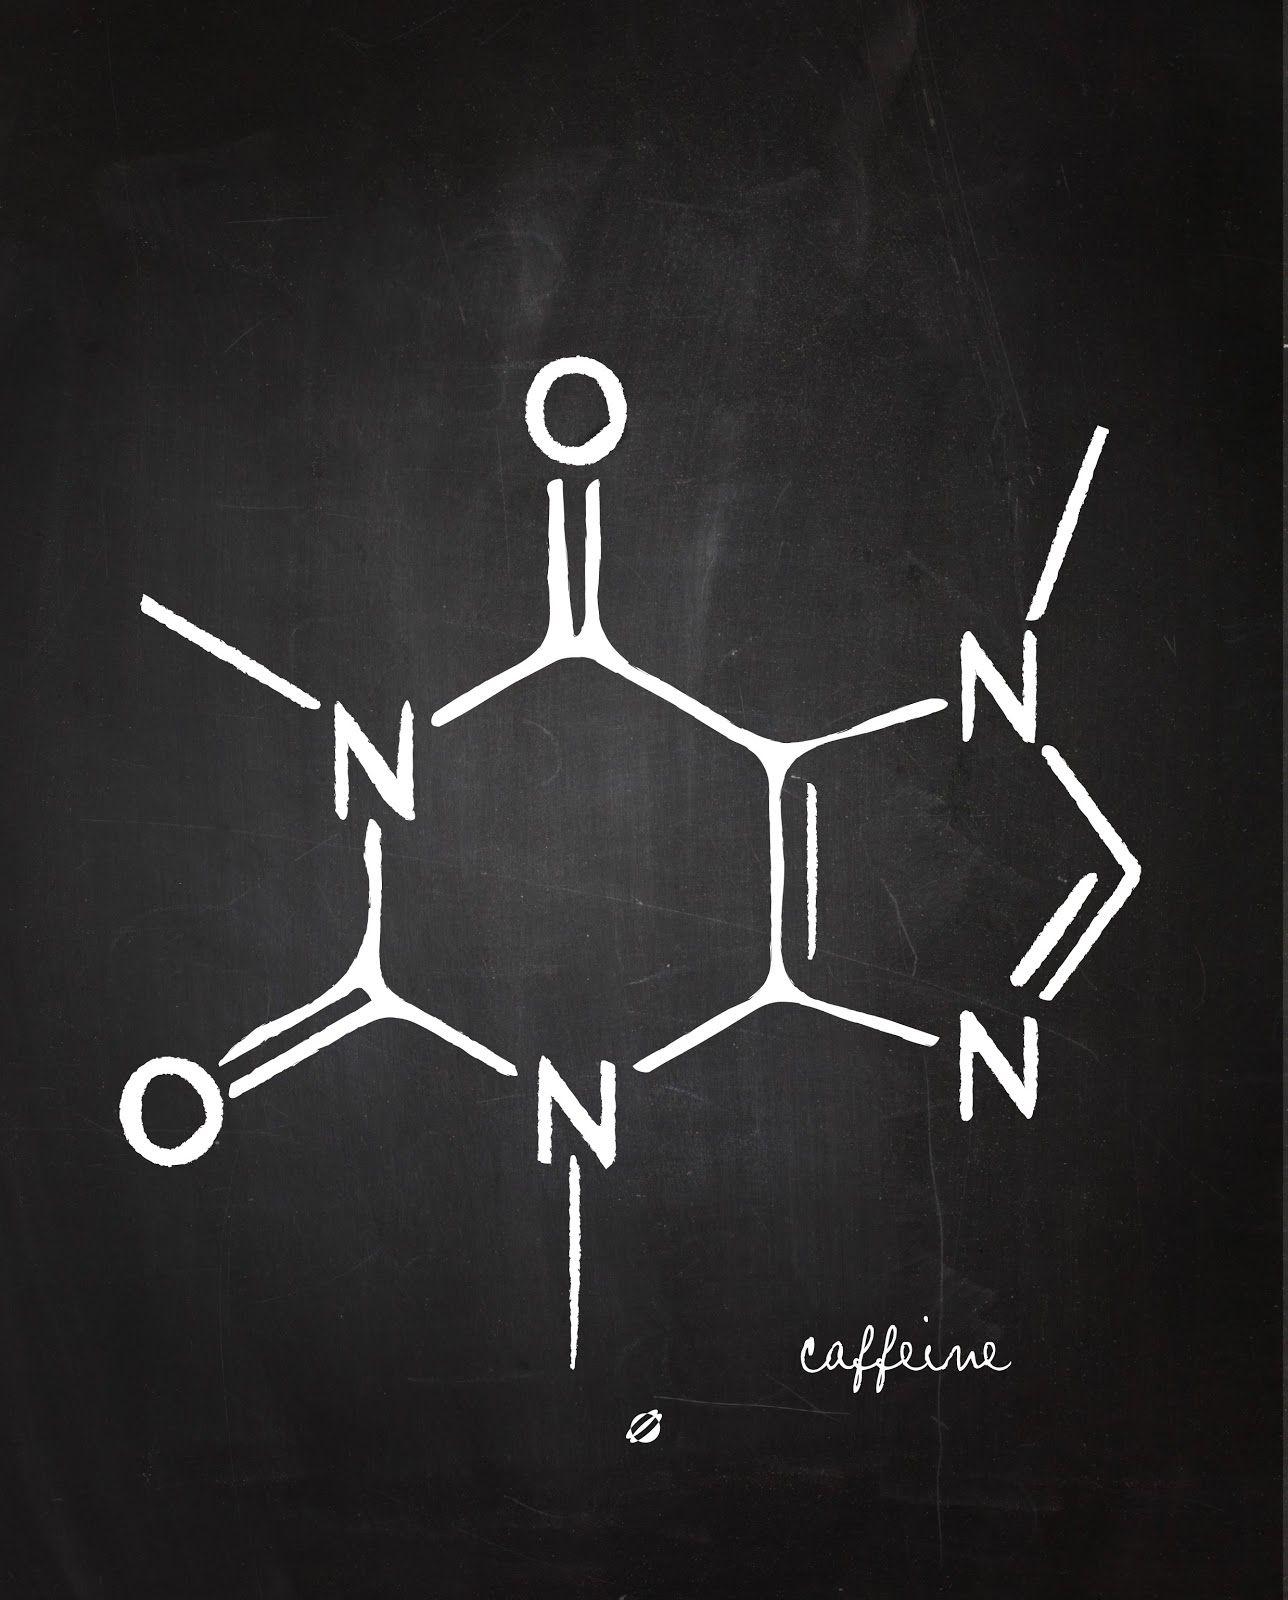 hight resolution of lostbumblebee 2014 caffeine chemistry 101 free printable plant science food science science humor